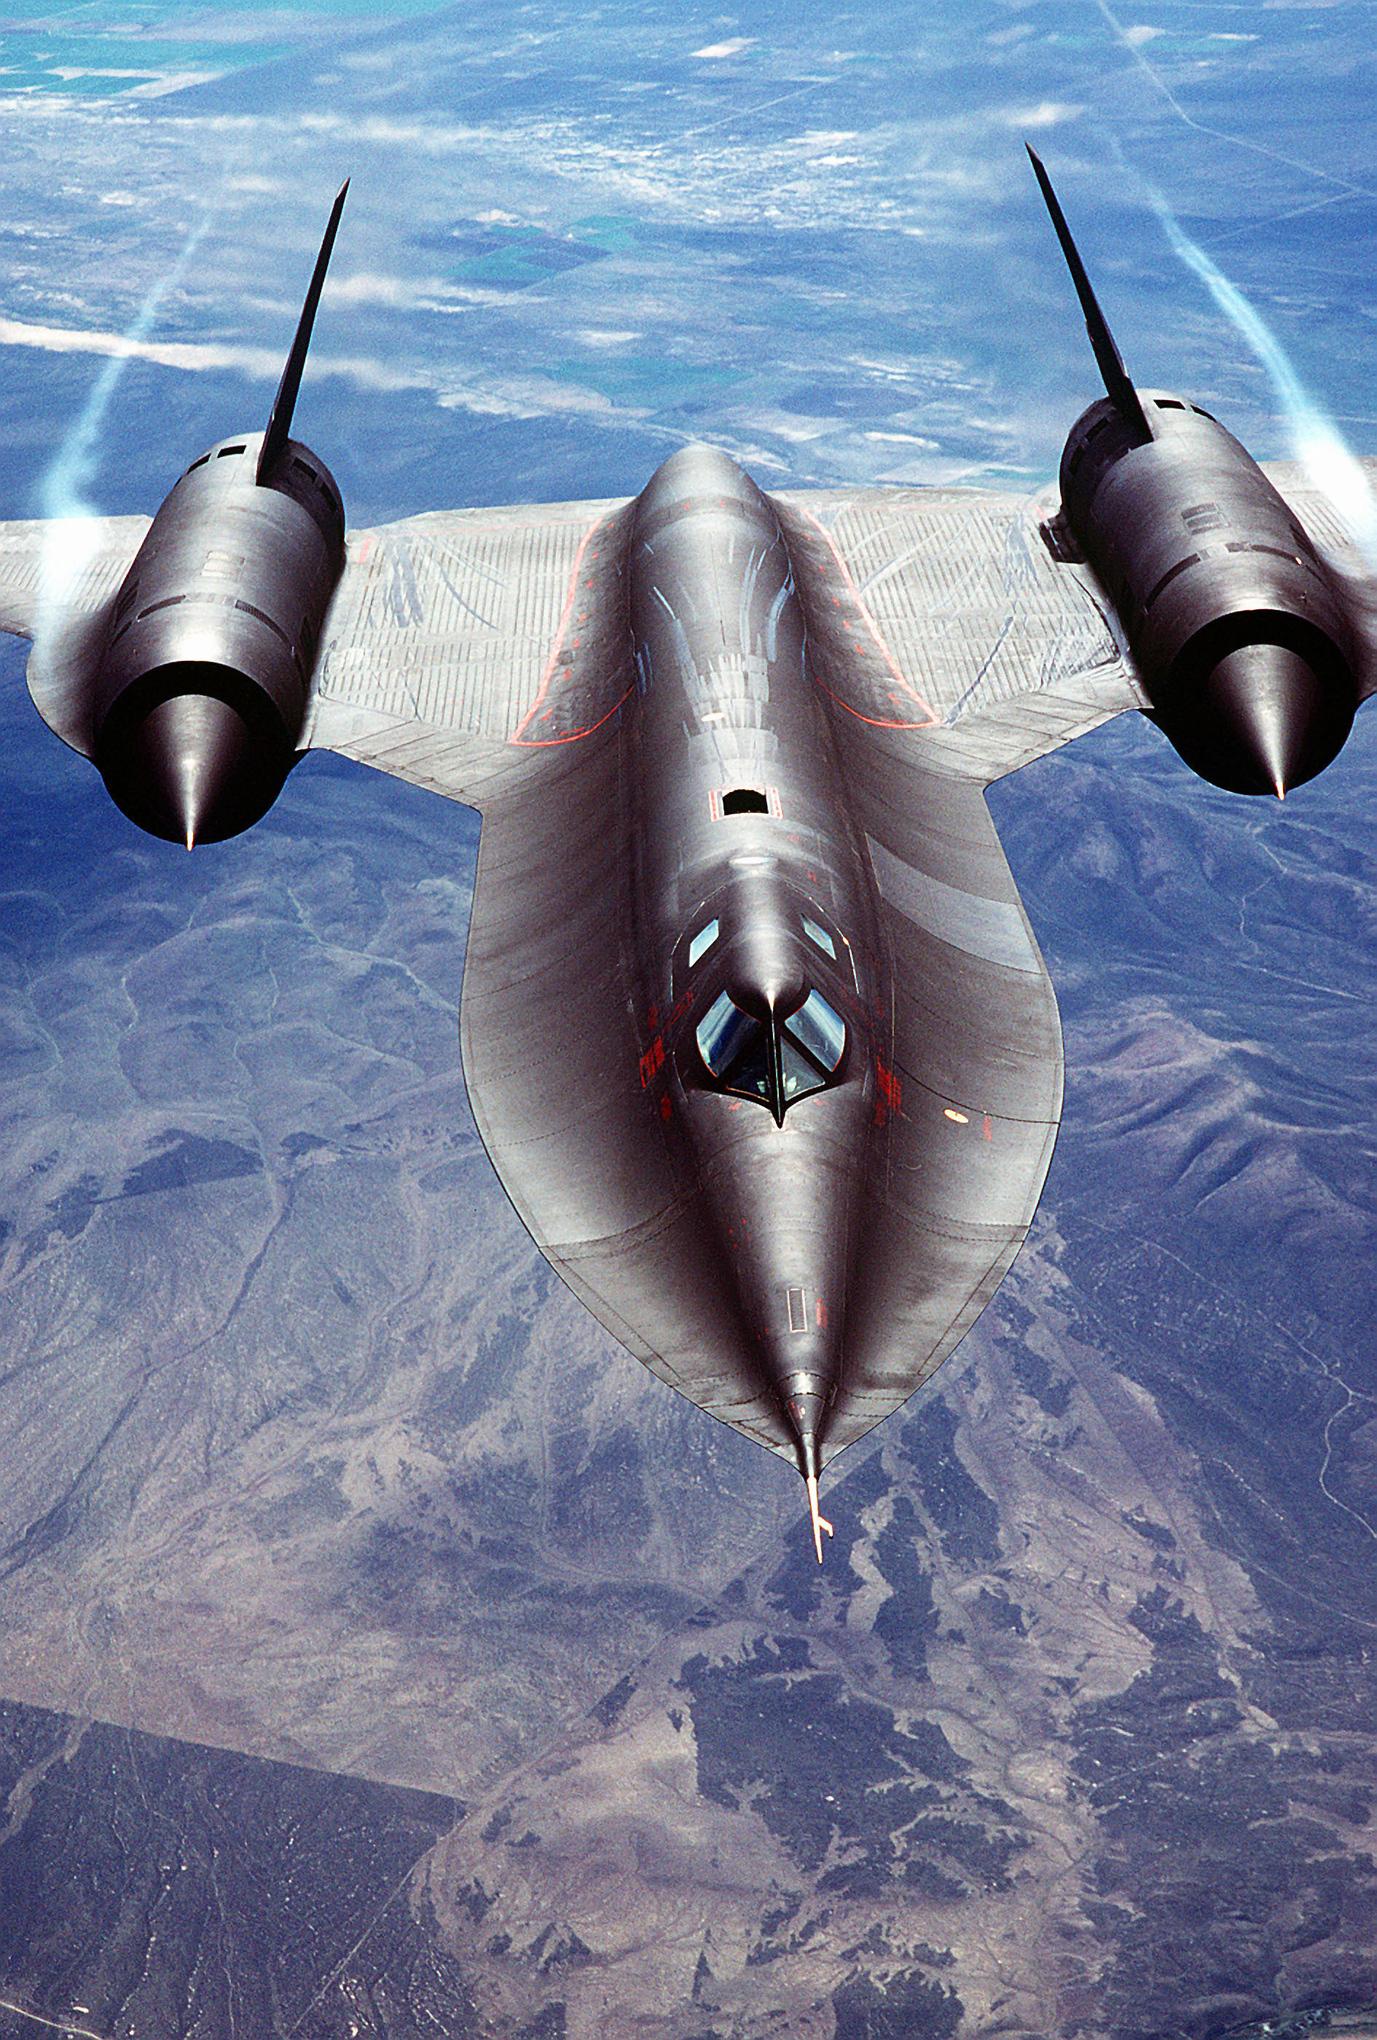 Flying The Worlds Fastest Plane Sr 71 Blackbird Phone